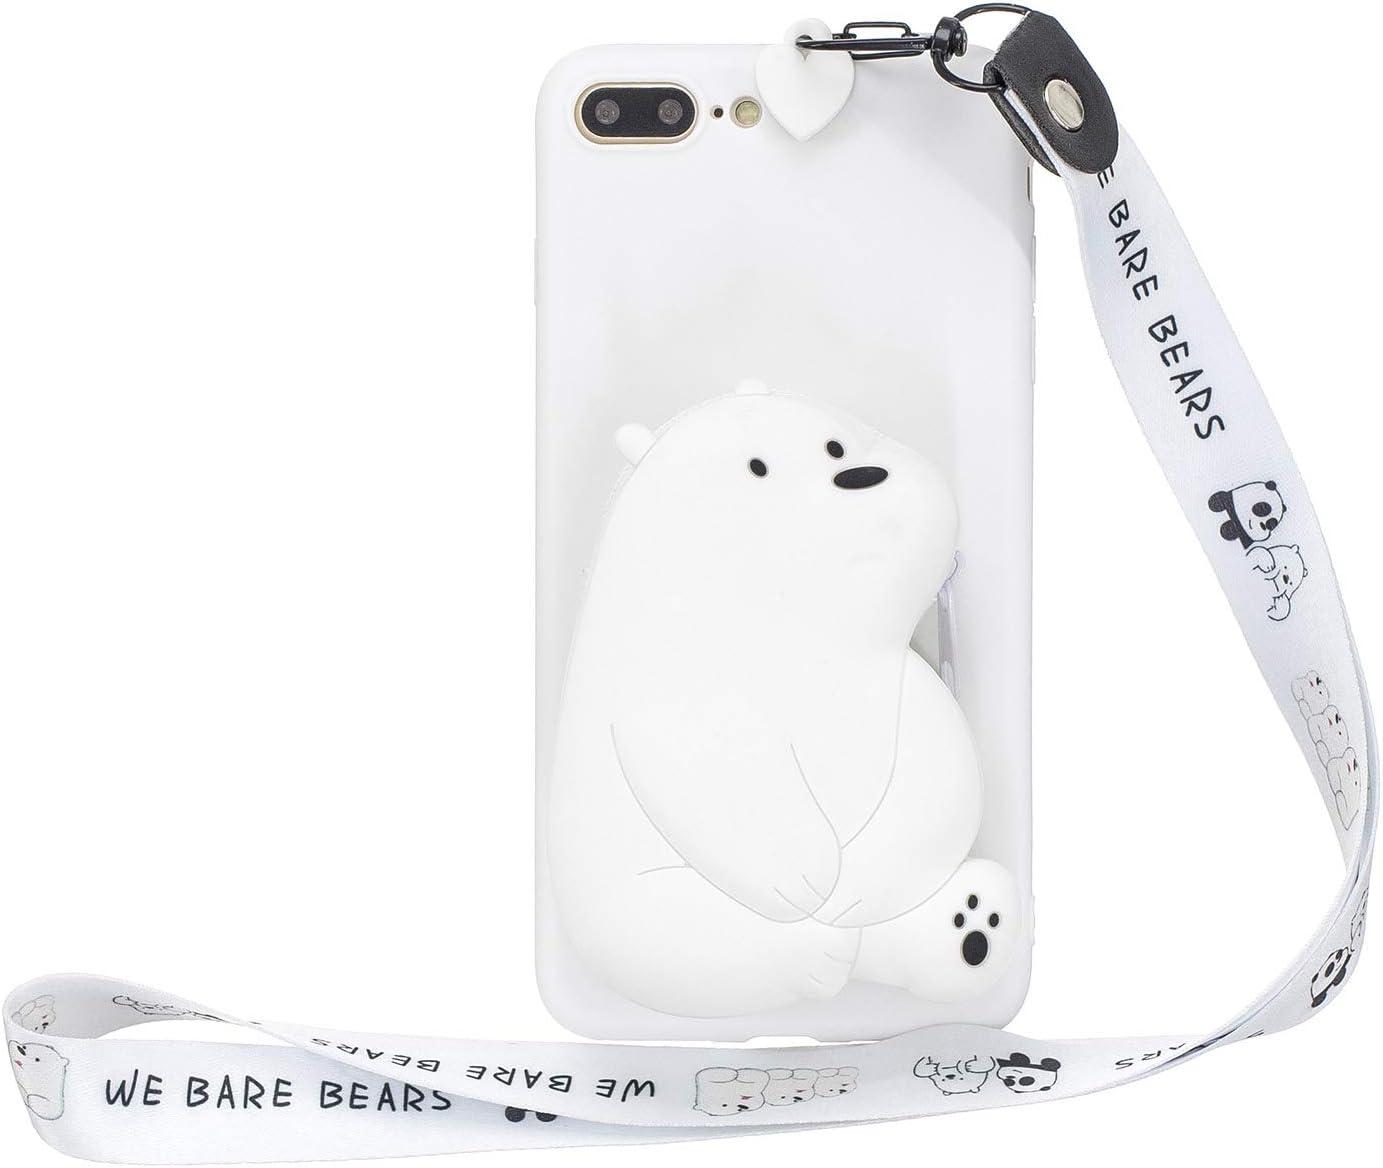 Yobby Cover per iPhone 7 Plus/8 Plus,Bianco Opaca Silicone 3D Orso Polare Animali Disegni Custodia Morbida Gomma Tasca con Cinturino,Kawaii Cool Moda ...